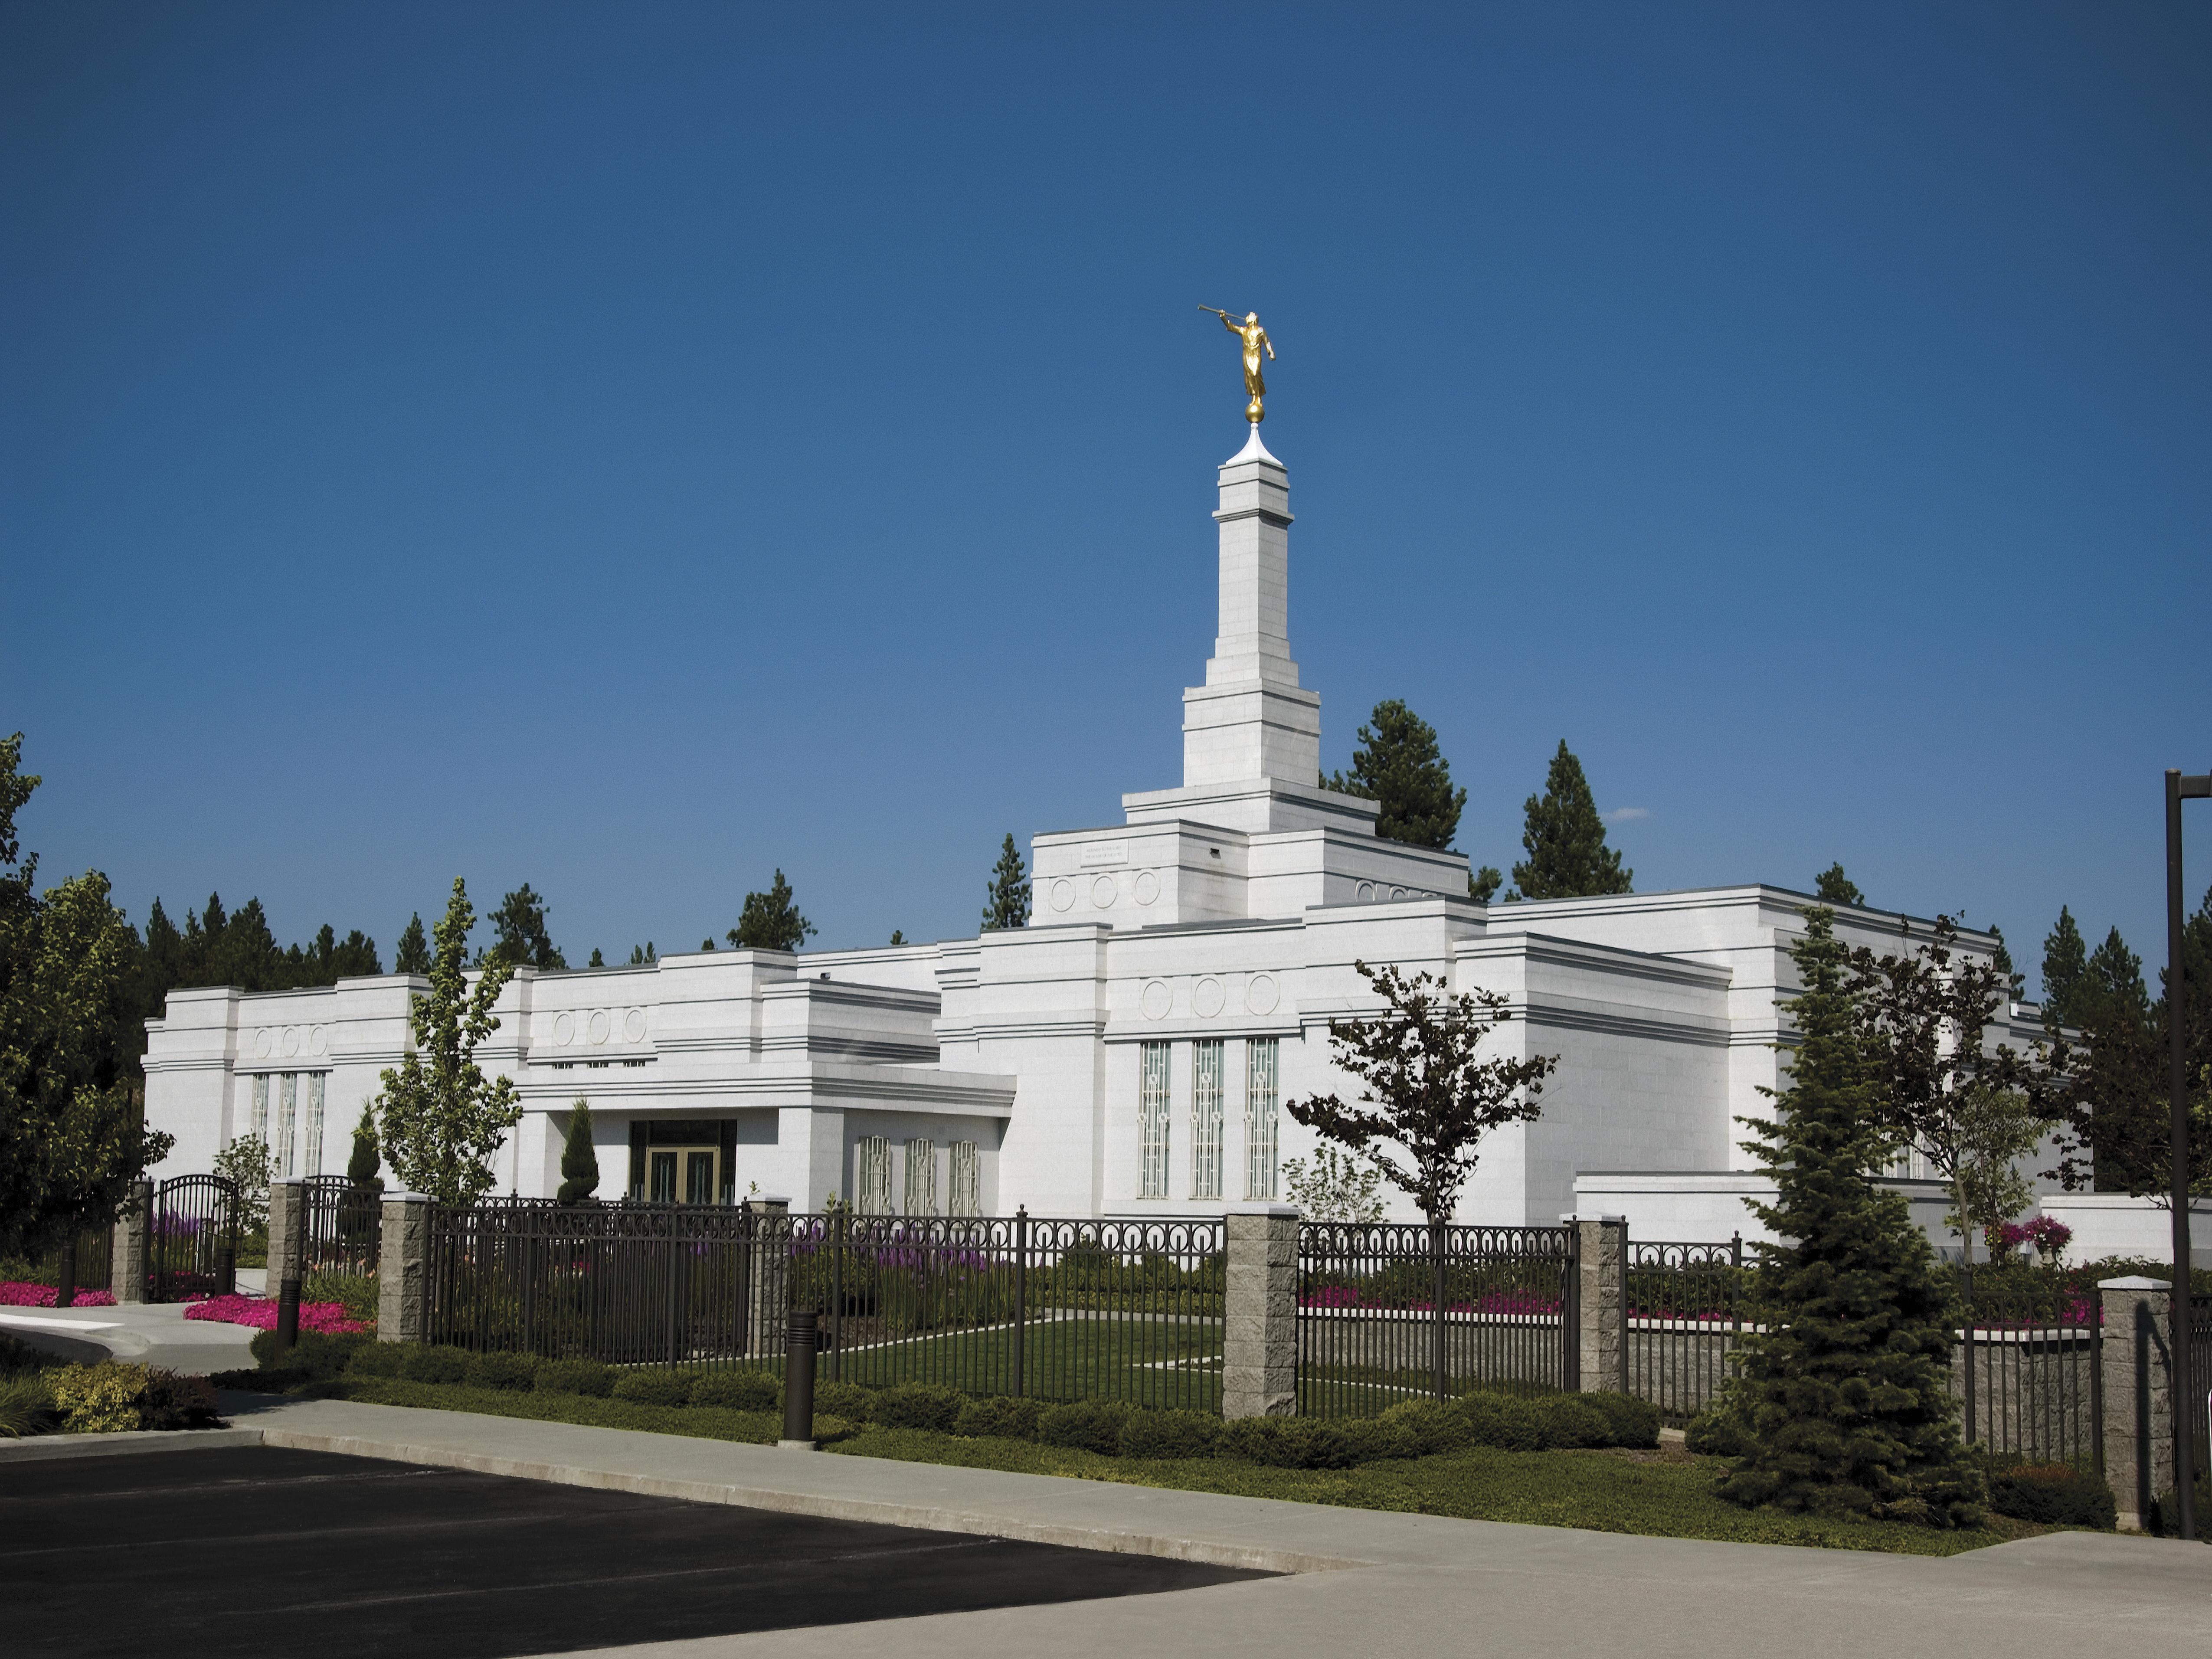 The Spokane Washington Temple on a clear day.